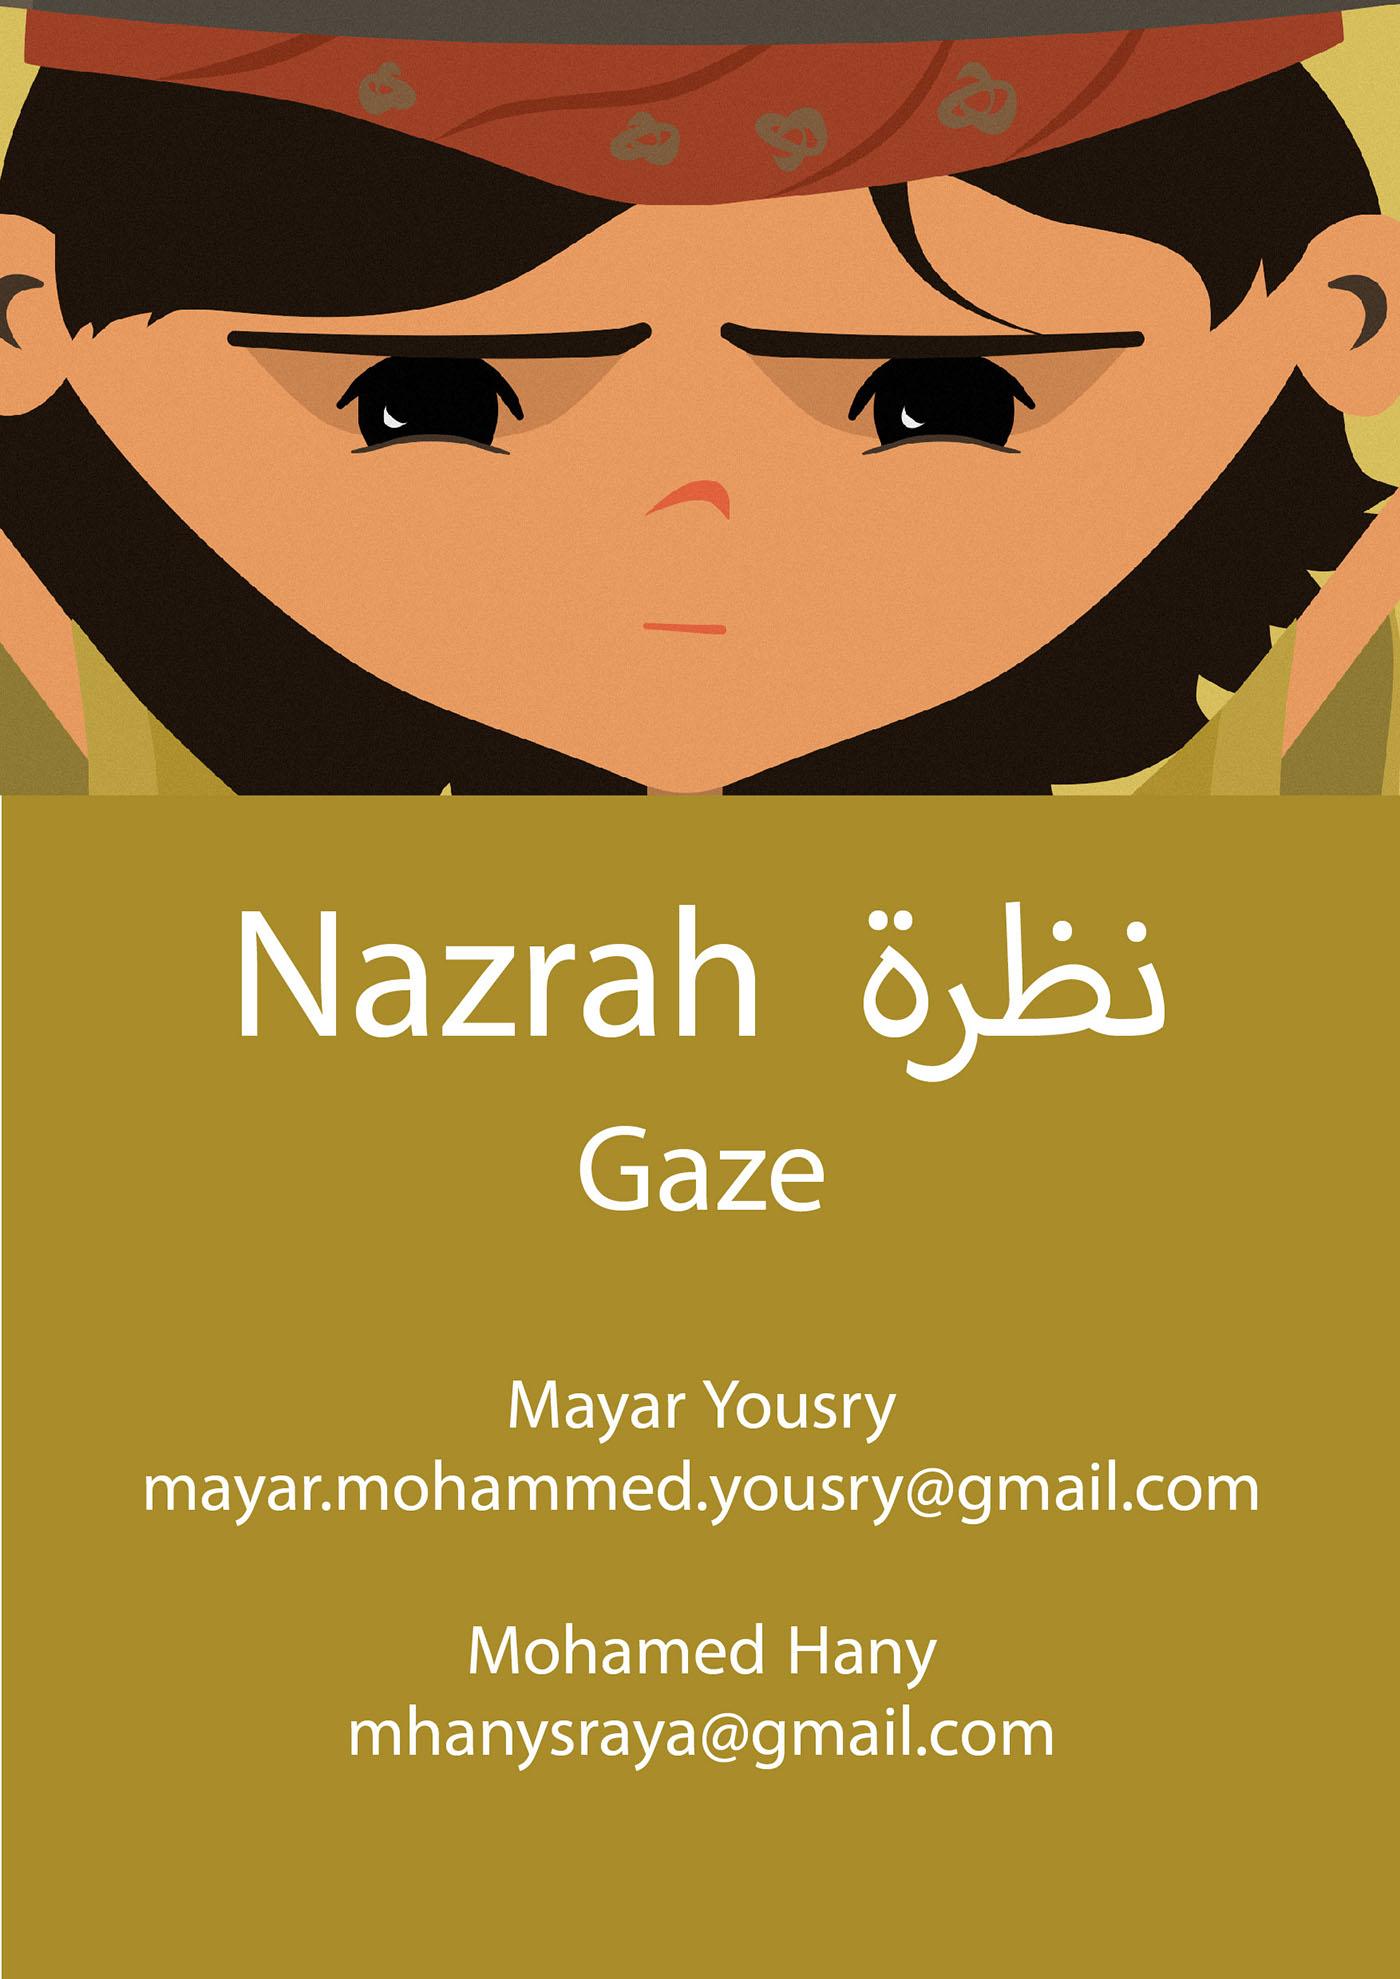 Nazraa (Gaze) short animation film on Behance